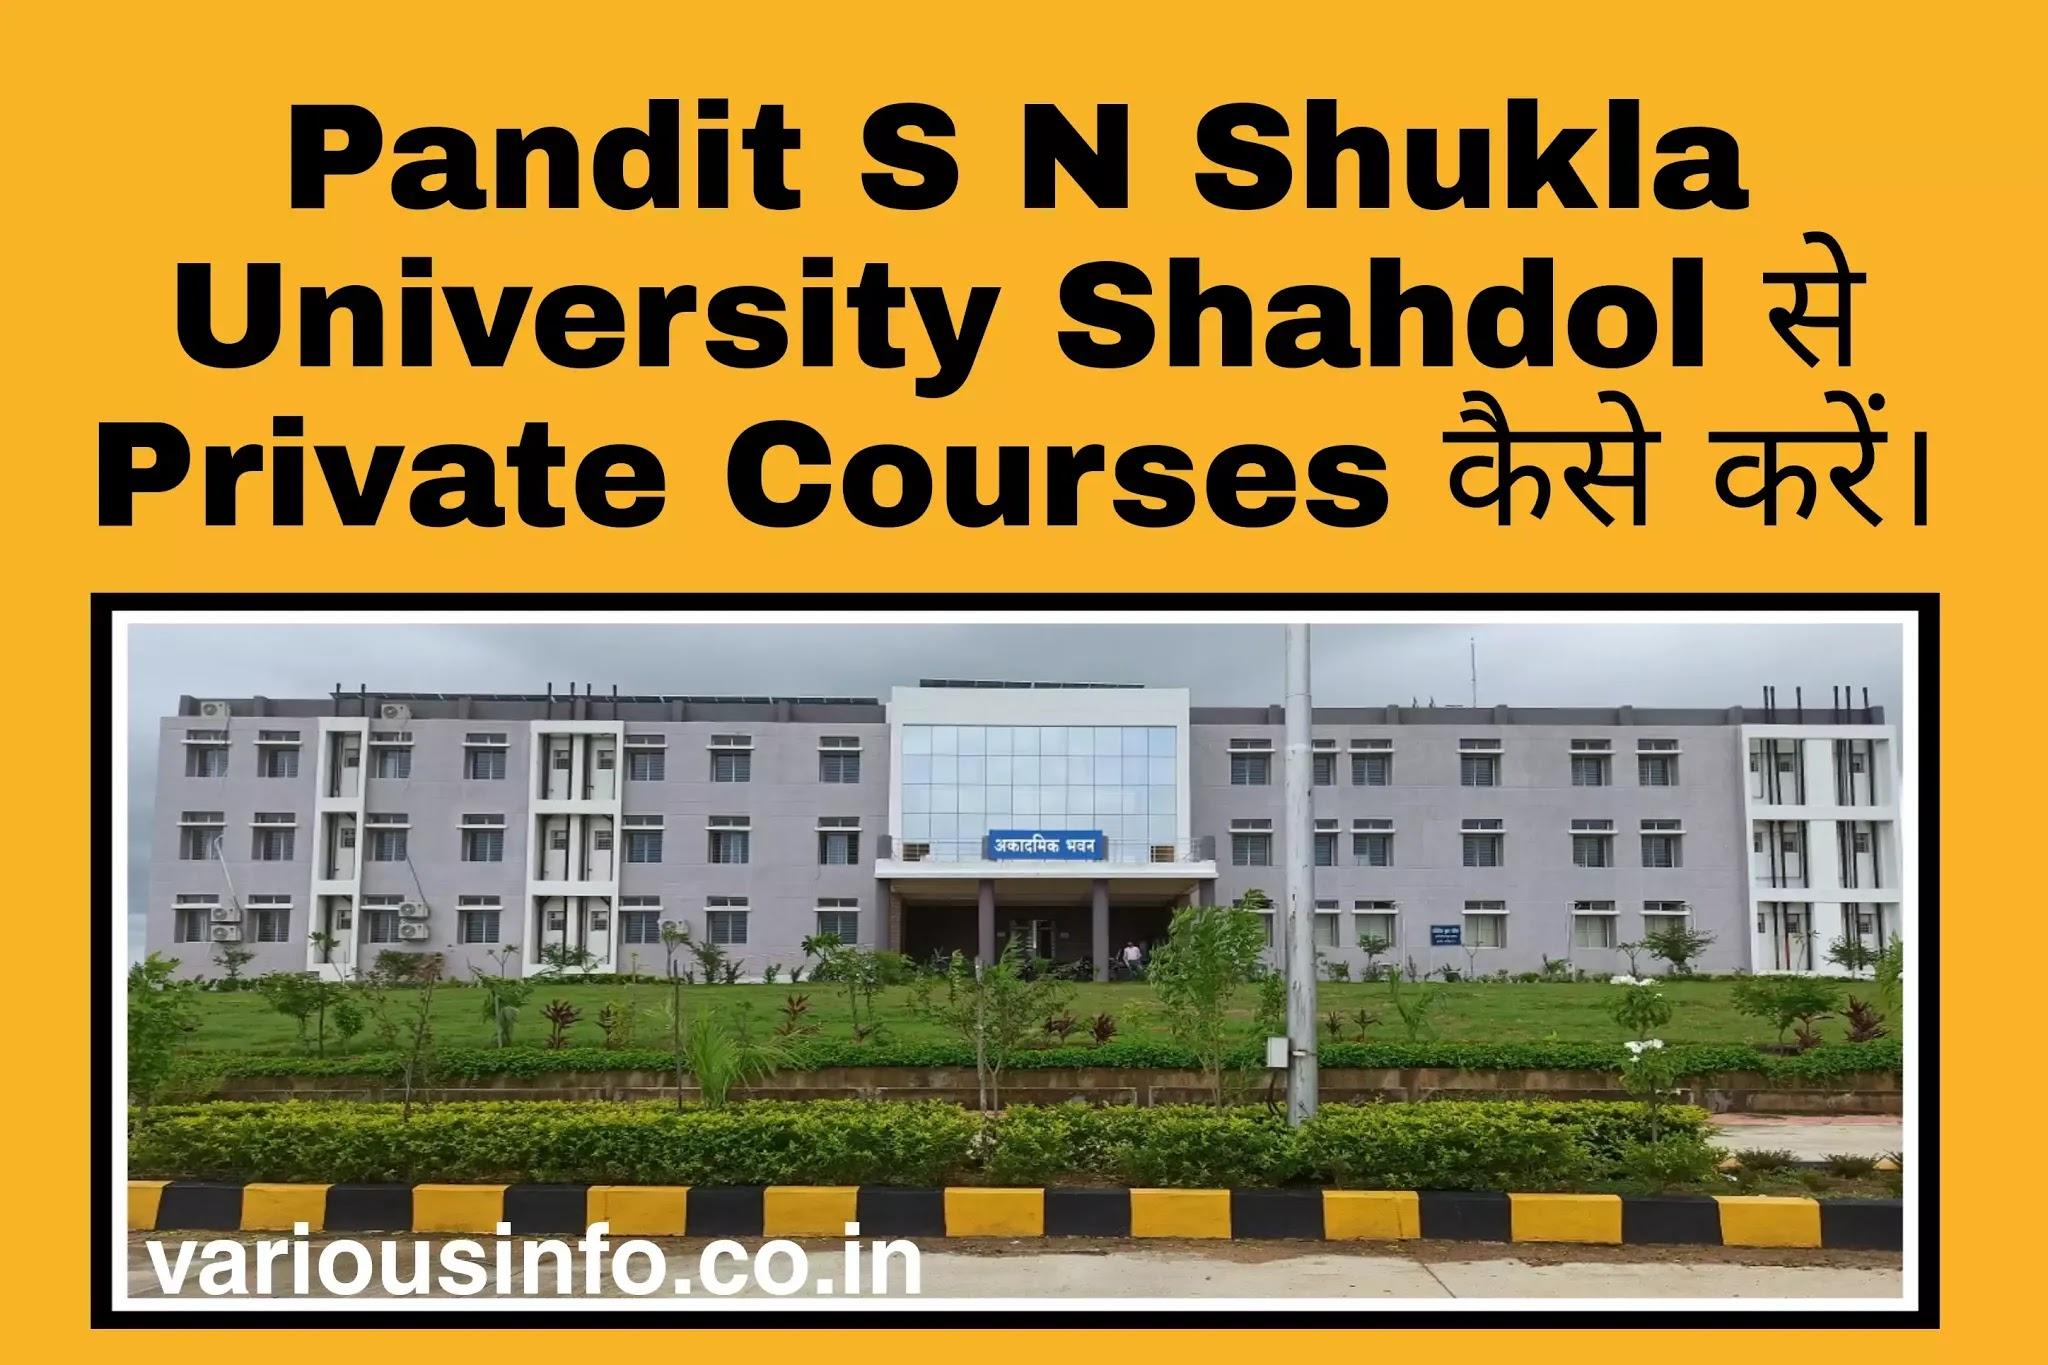 Pandit S N Shukla University Shahdol से Private Courses कैसे करें।